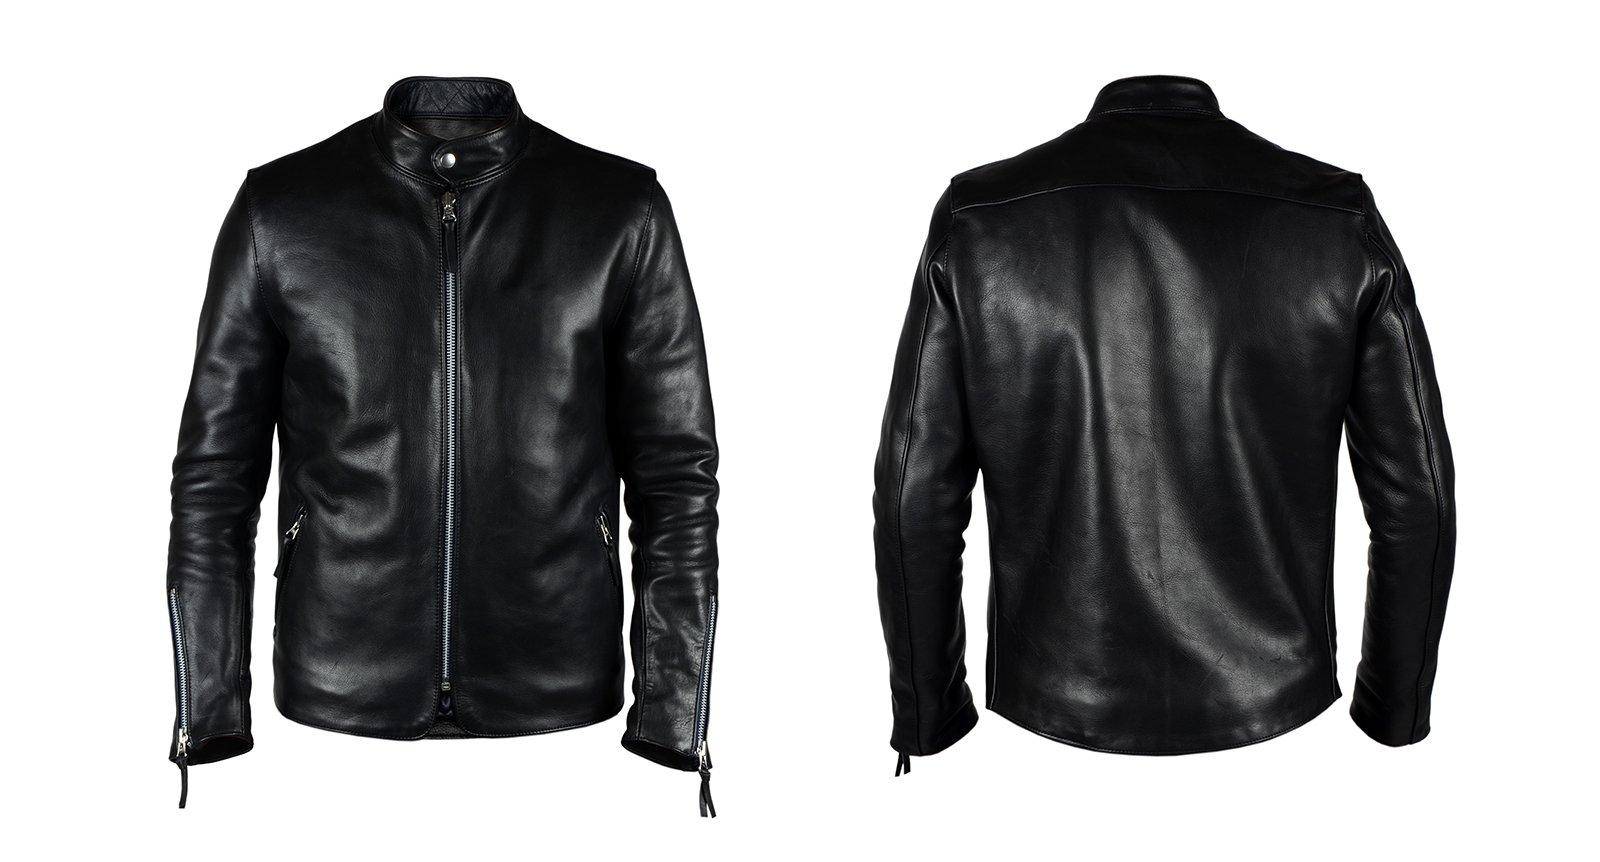 Kraken Leather Jacket.